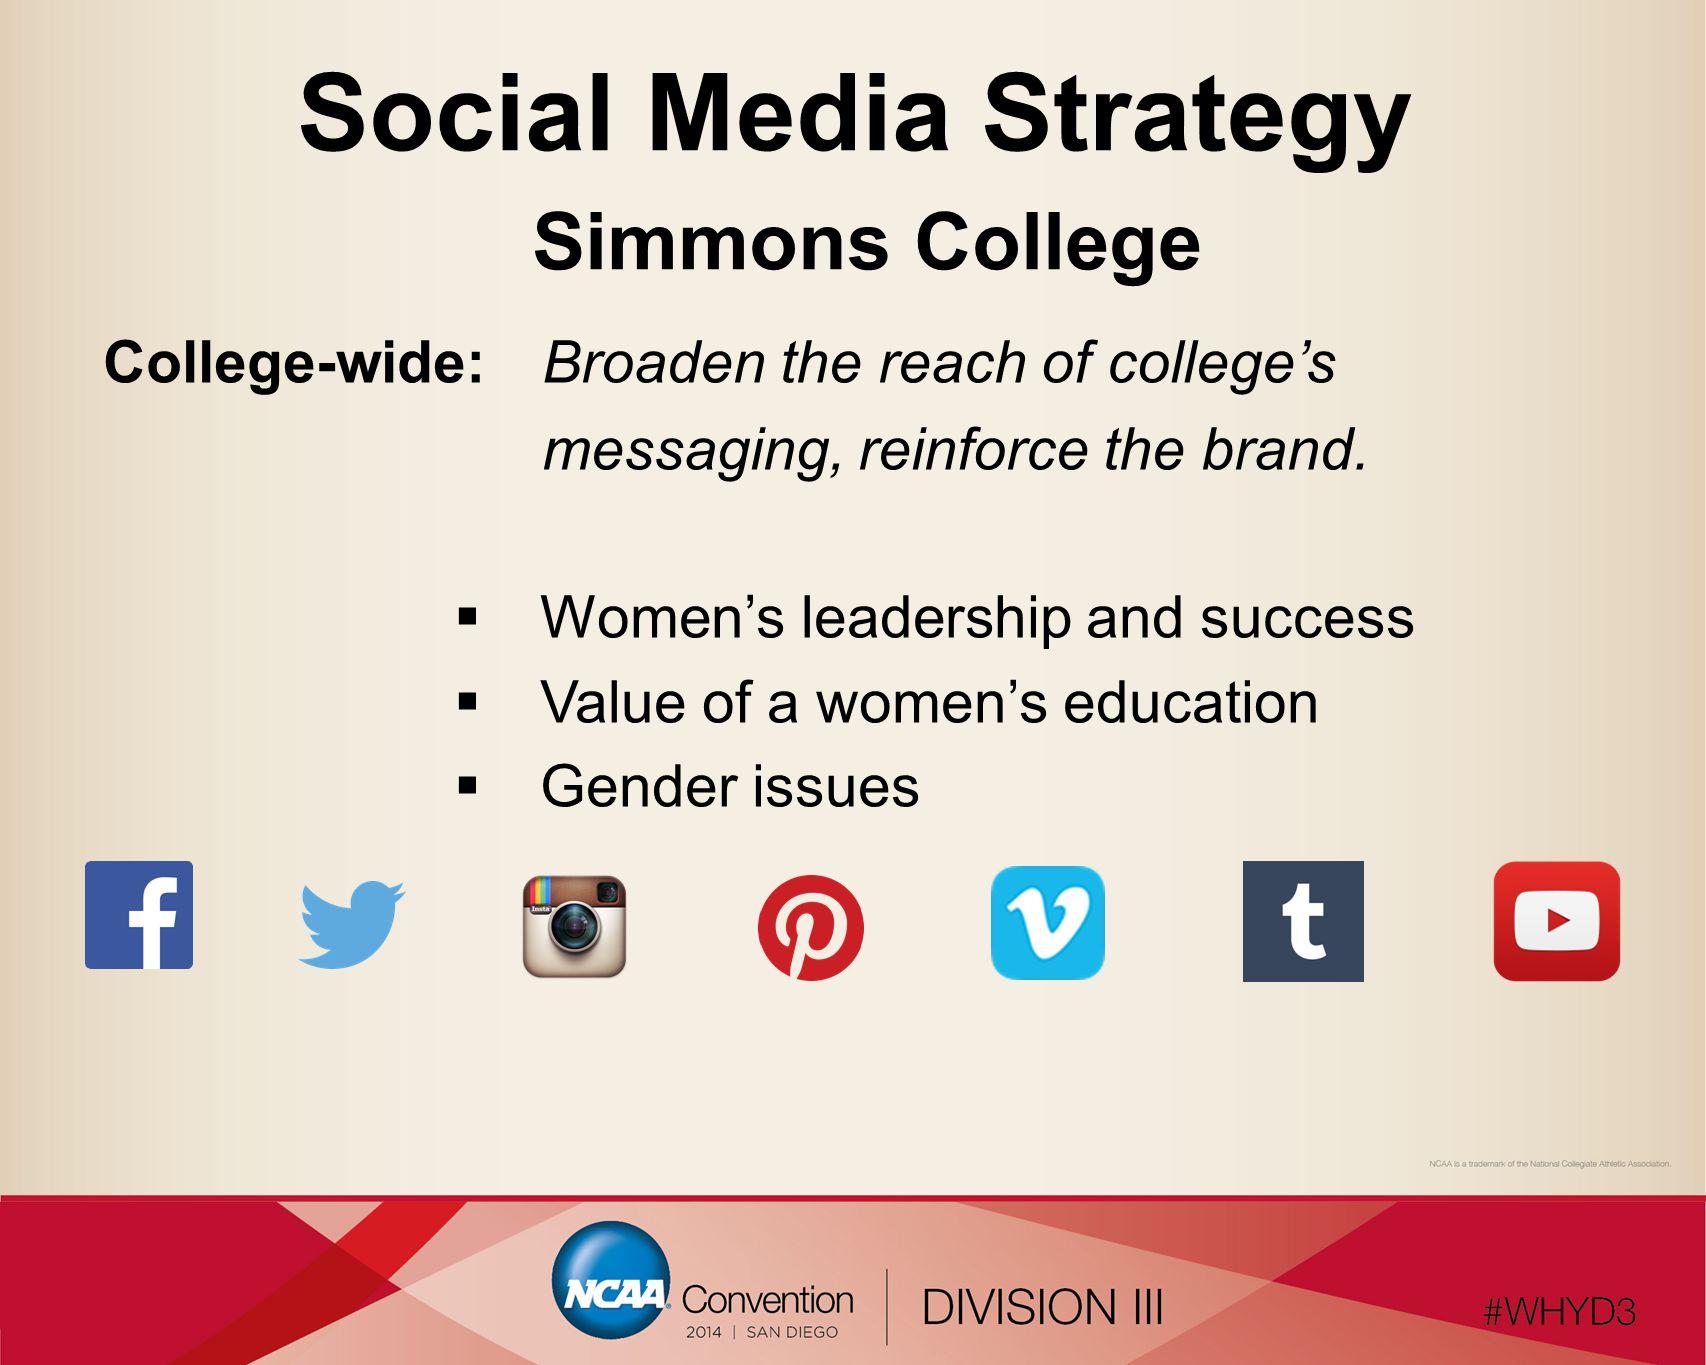 Social Media: Simmons College Simmons Athletics: No social media strategy.